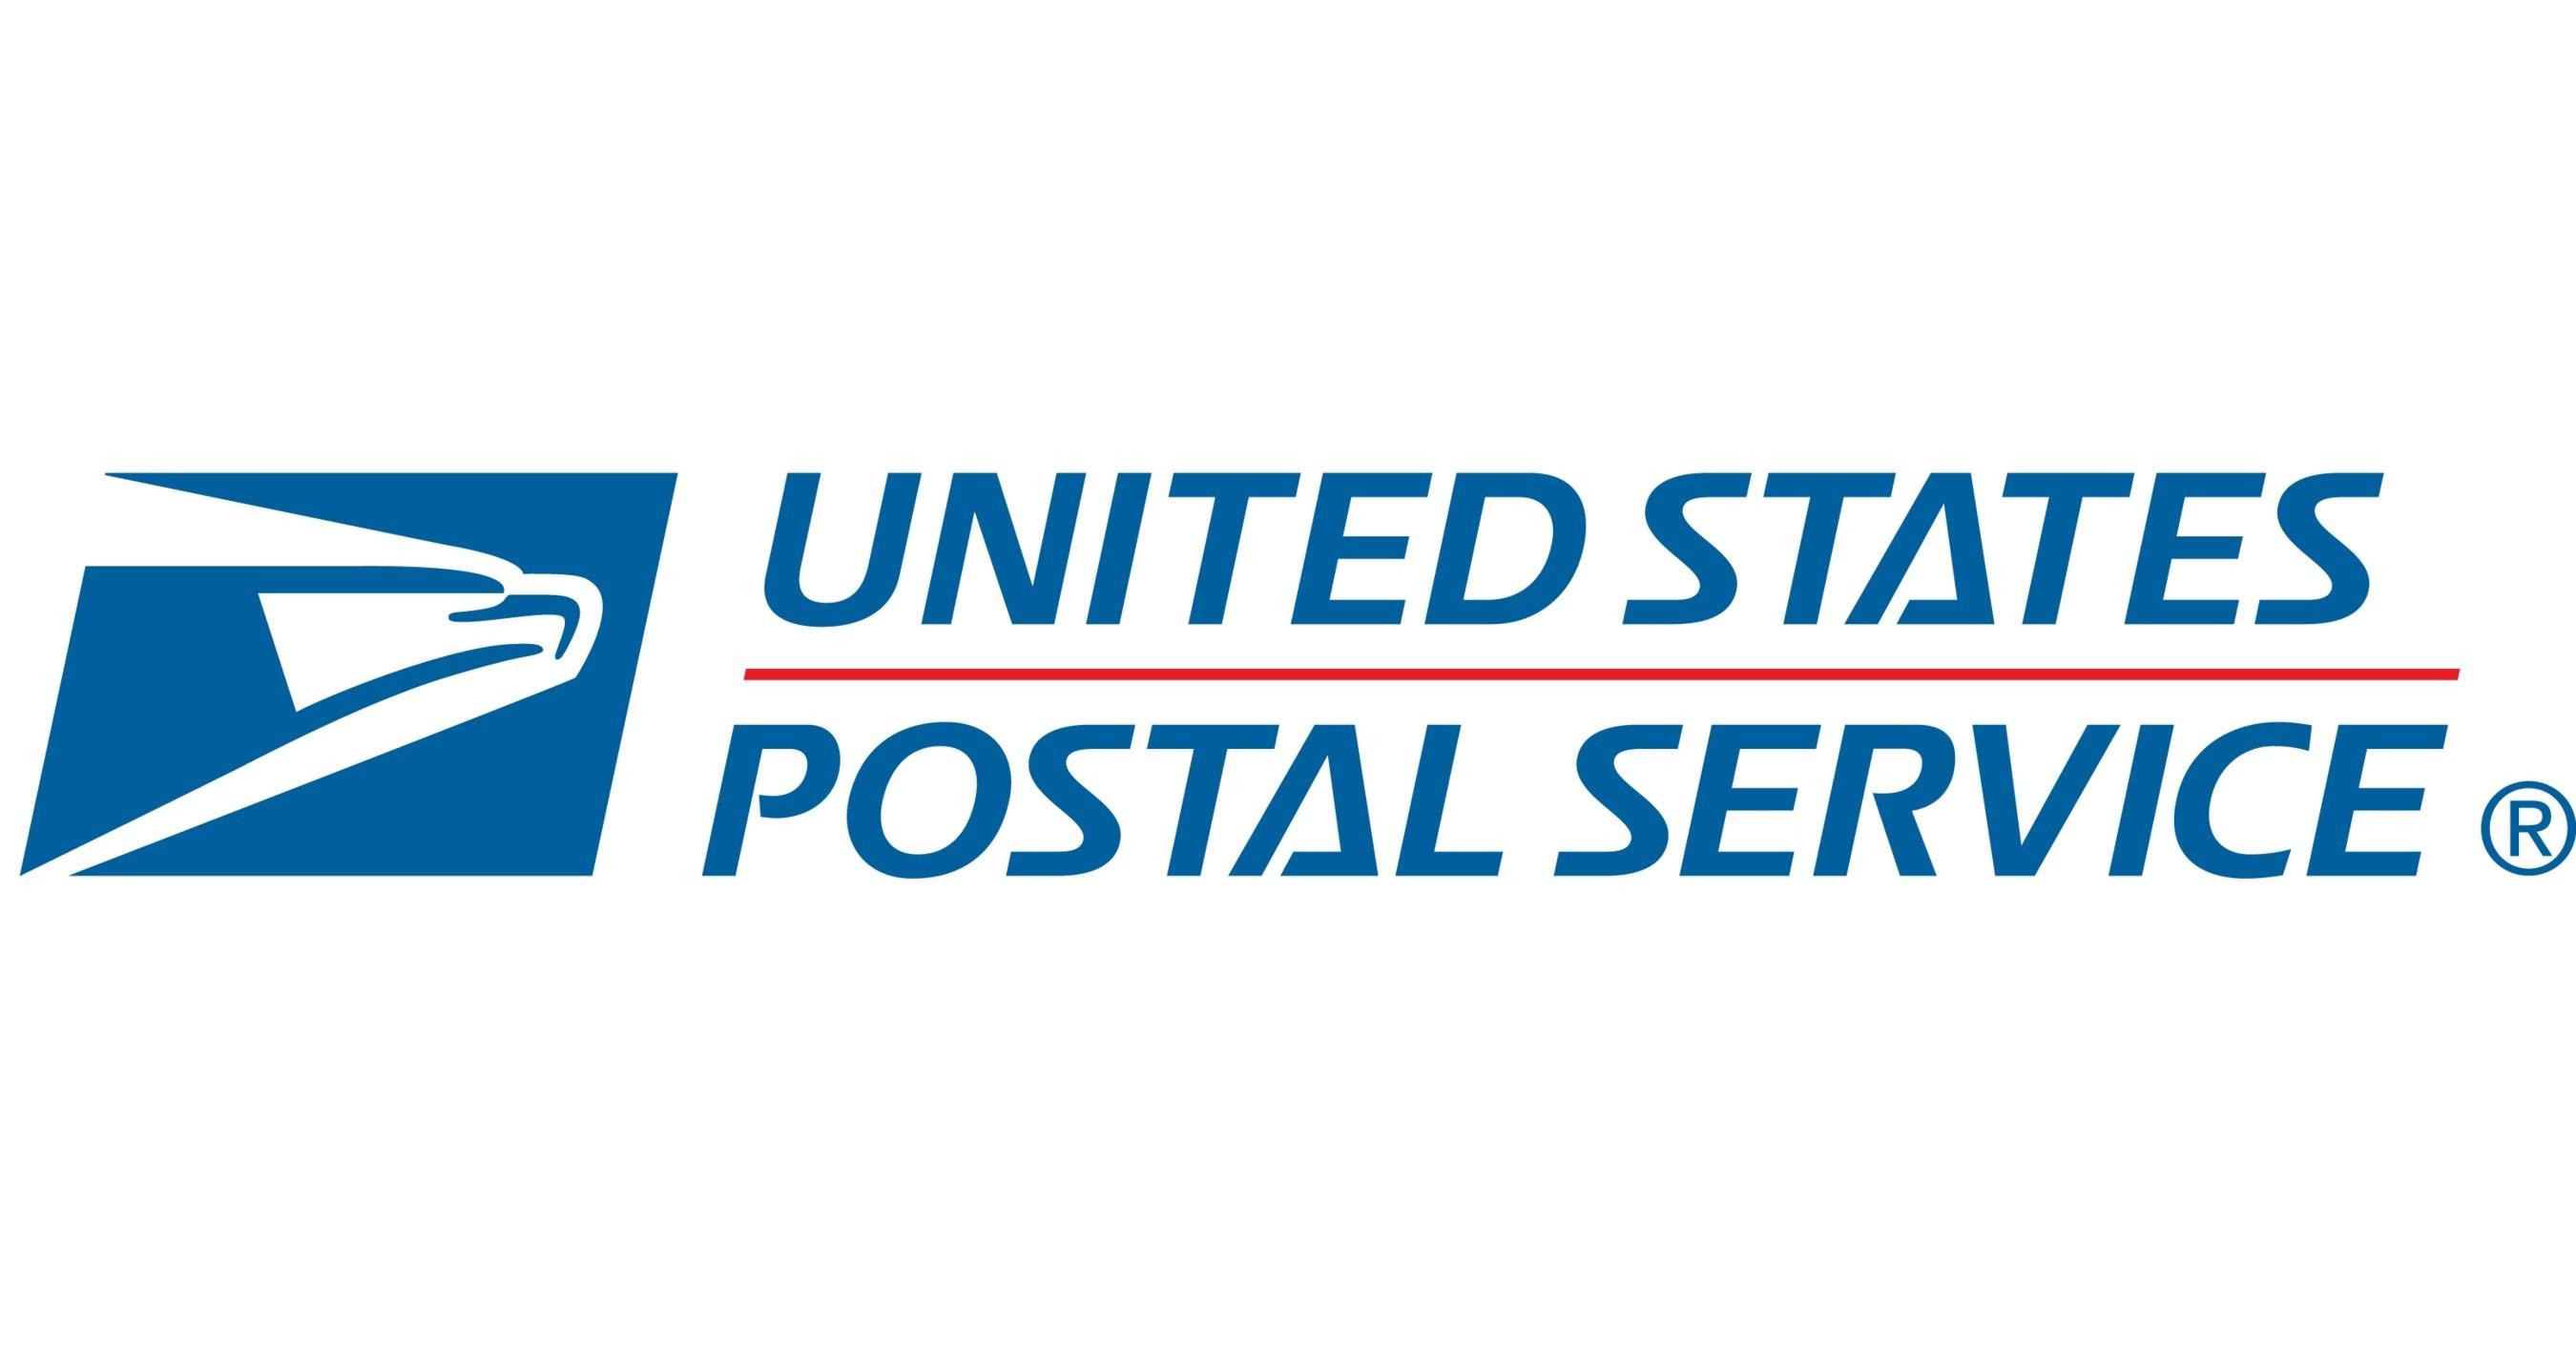 USPS Logo jpg?p=facebook.'